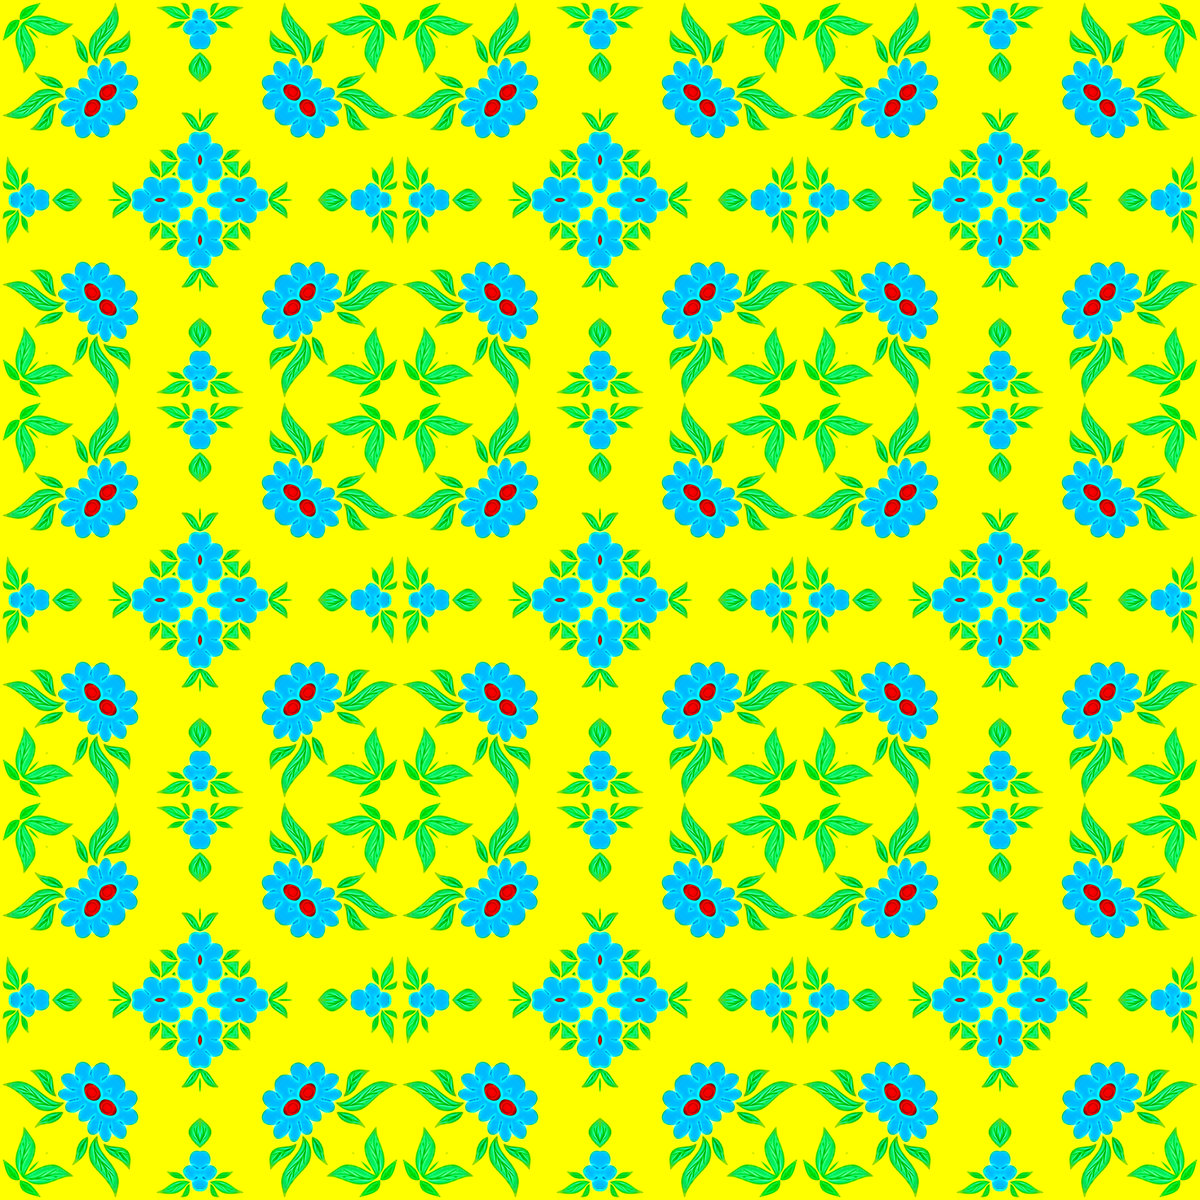 Паттерны и бесшовные текстуры бесплатно / Patterns and seamless textures for free, p_i_r_a_n_y_a - Бесшовная фактура - Незабудки